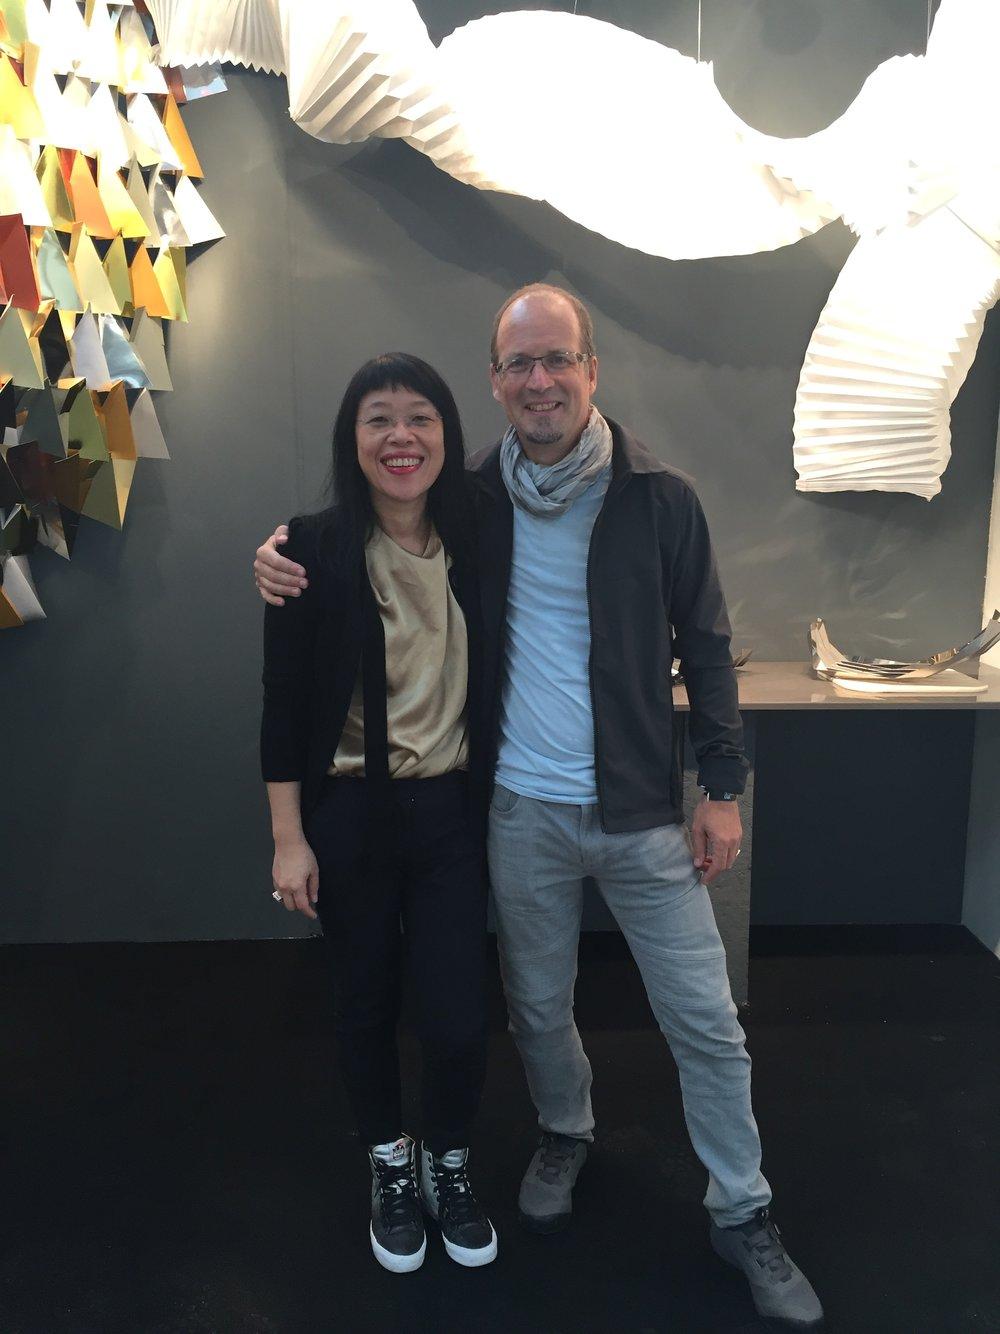 Angela Fung and Ashley Bedord